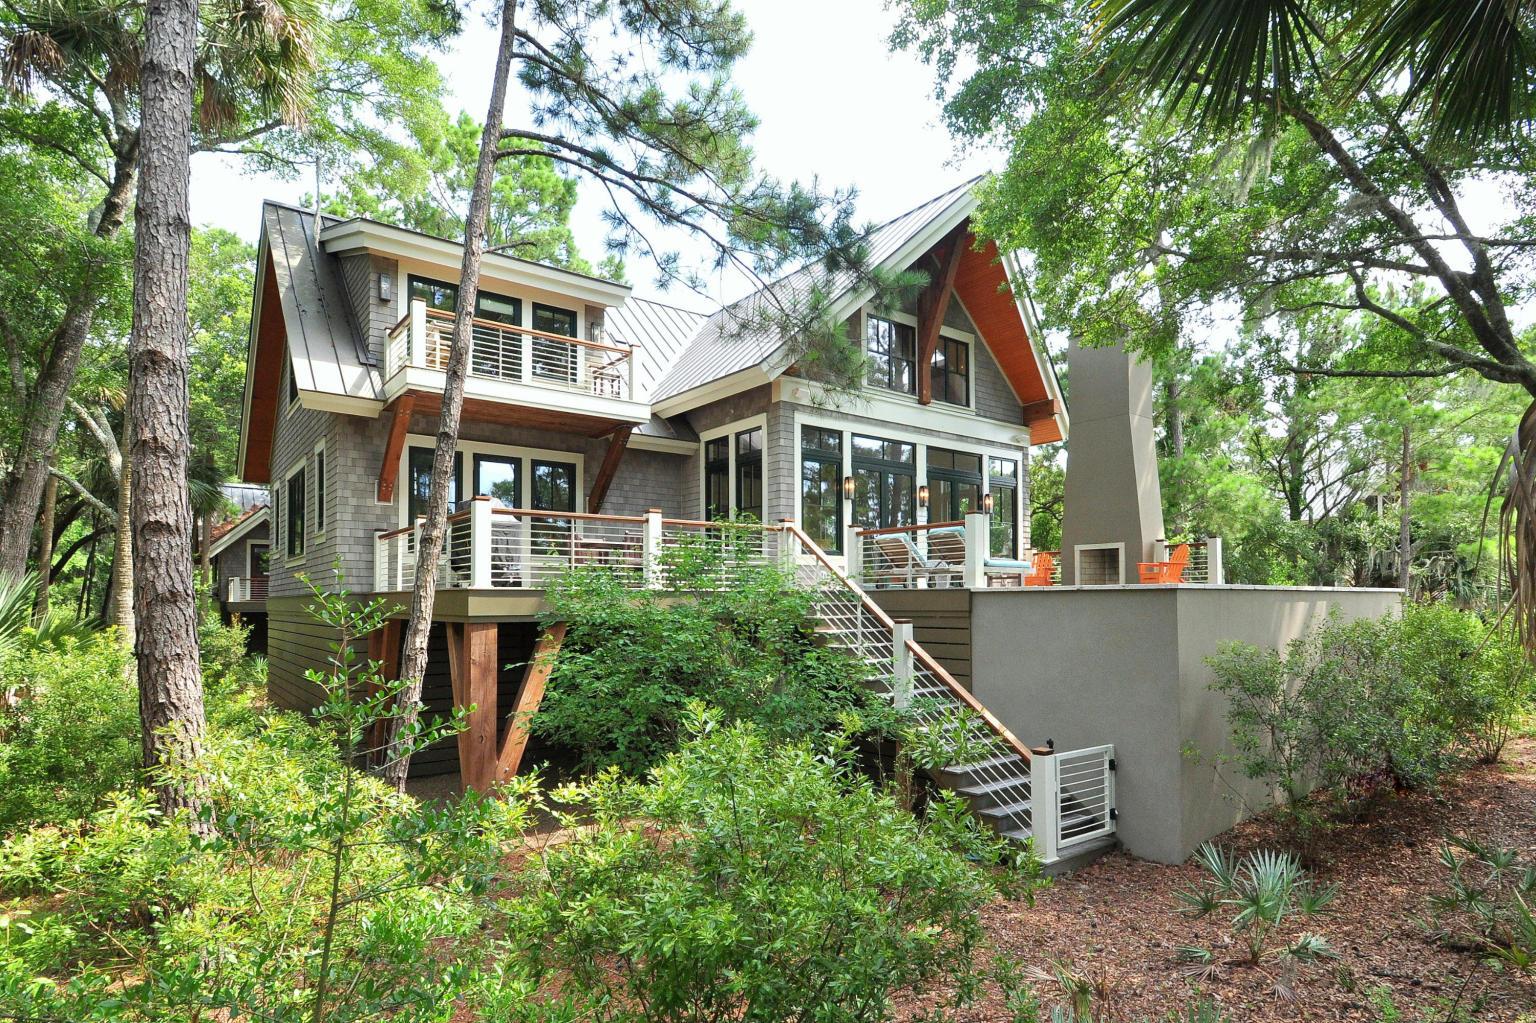 Single Family Home for Sale at 123 Halona Lane Kiawah Island, South Carolina 29455 United States